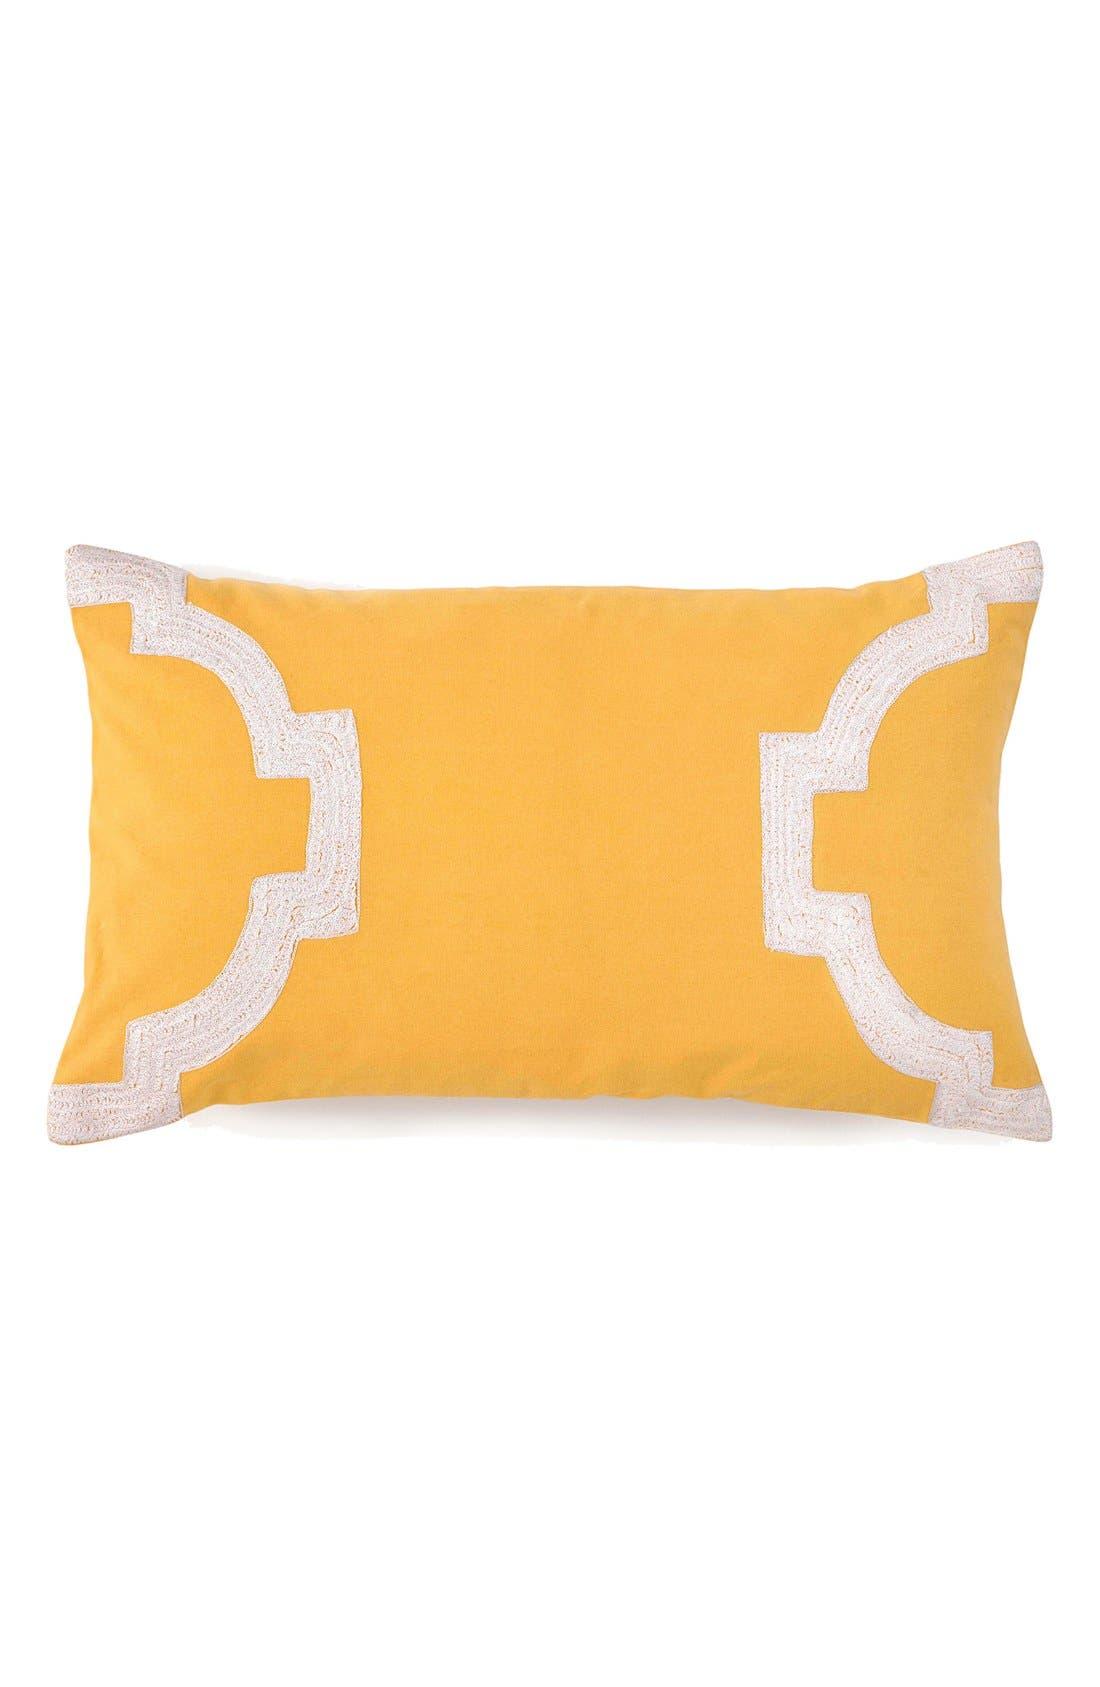 JILL ROSENWALD 'Hampton Links' Pillow